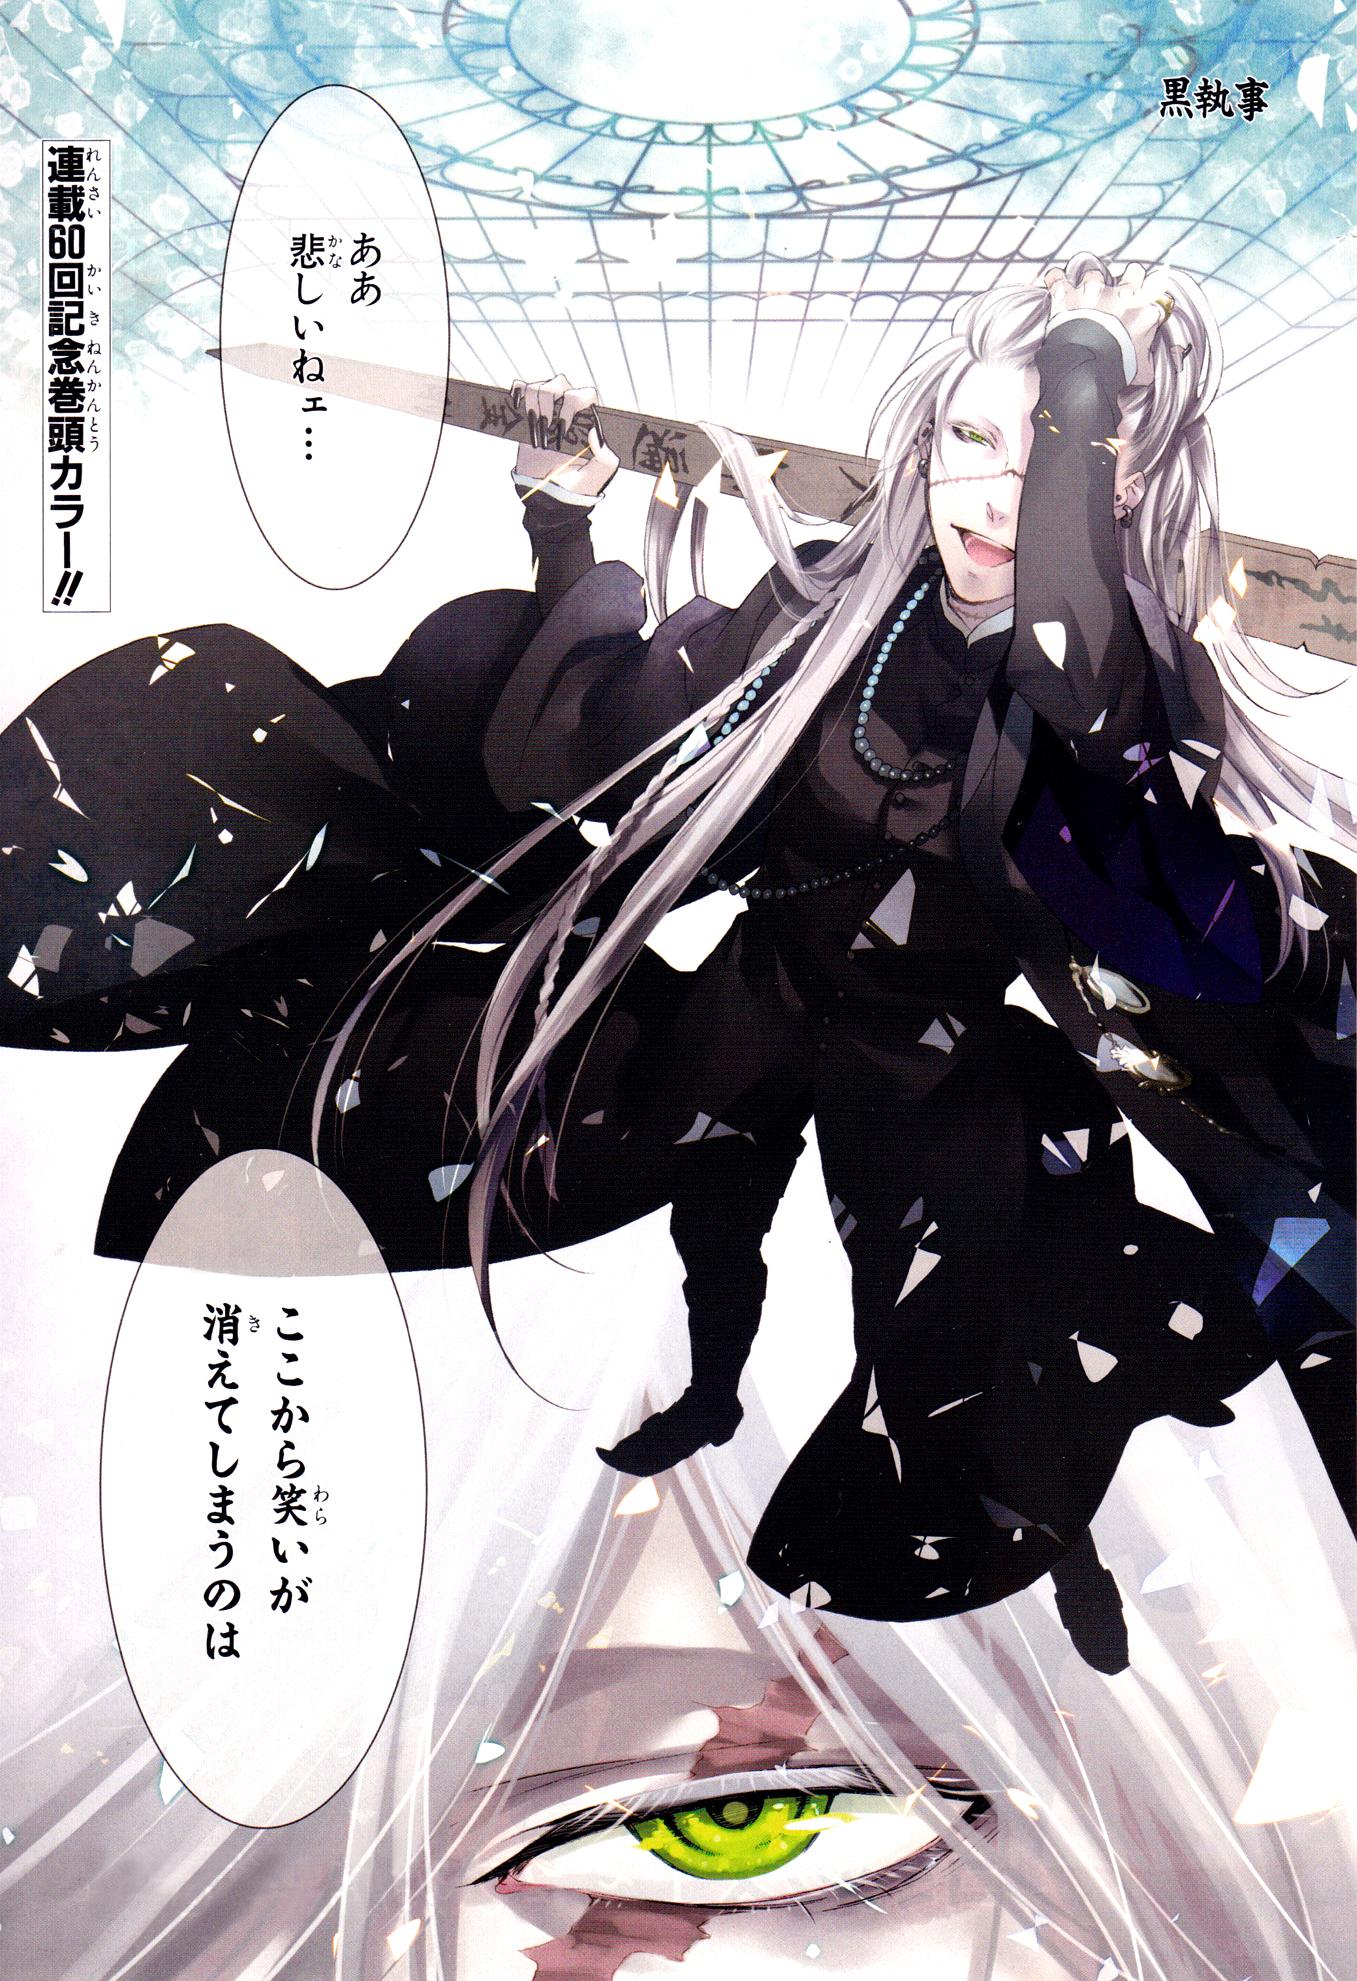 Kuroshitsuji Black Butler Mobile Wallpaper